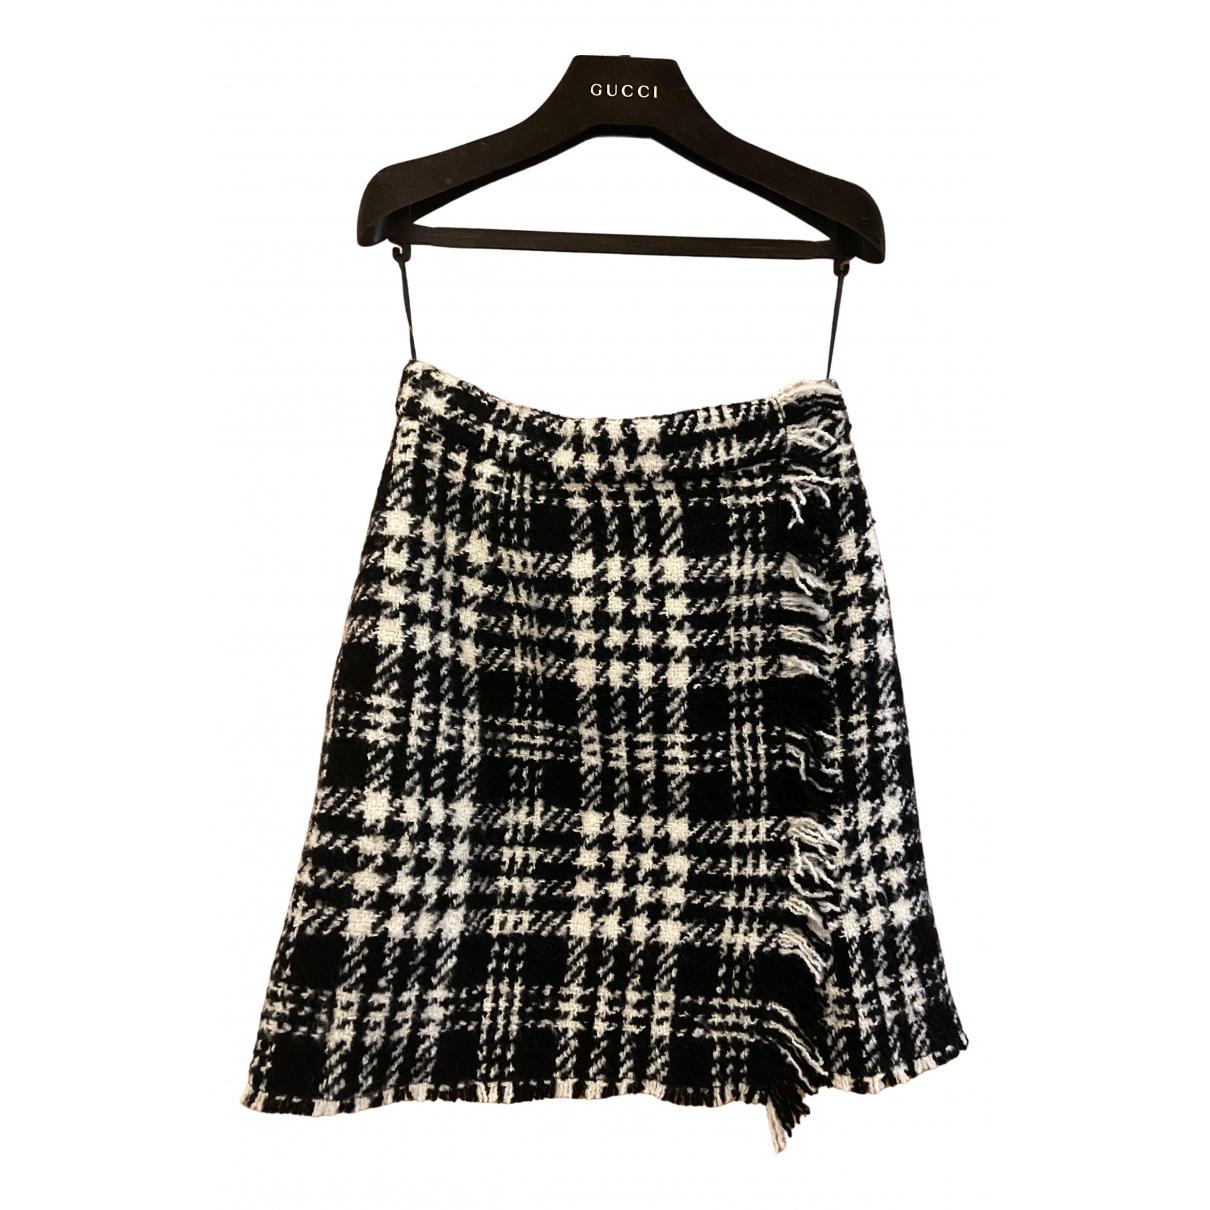 Dolce & Gabbana \N Wool skirt for Women 38 IT